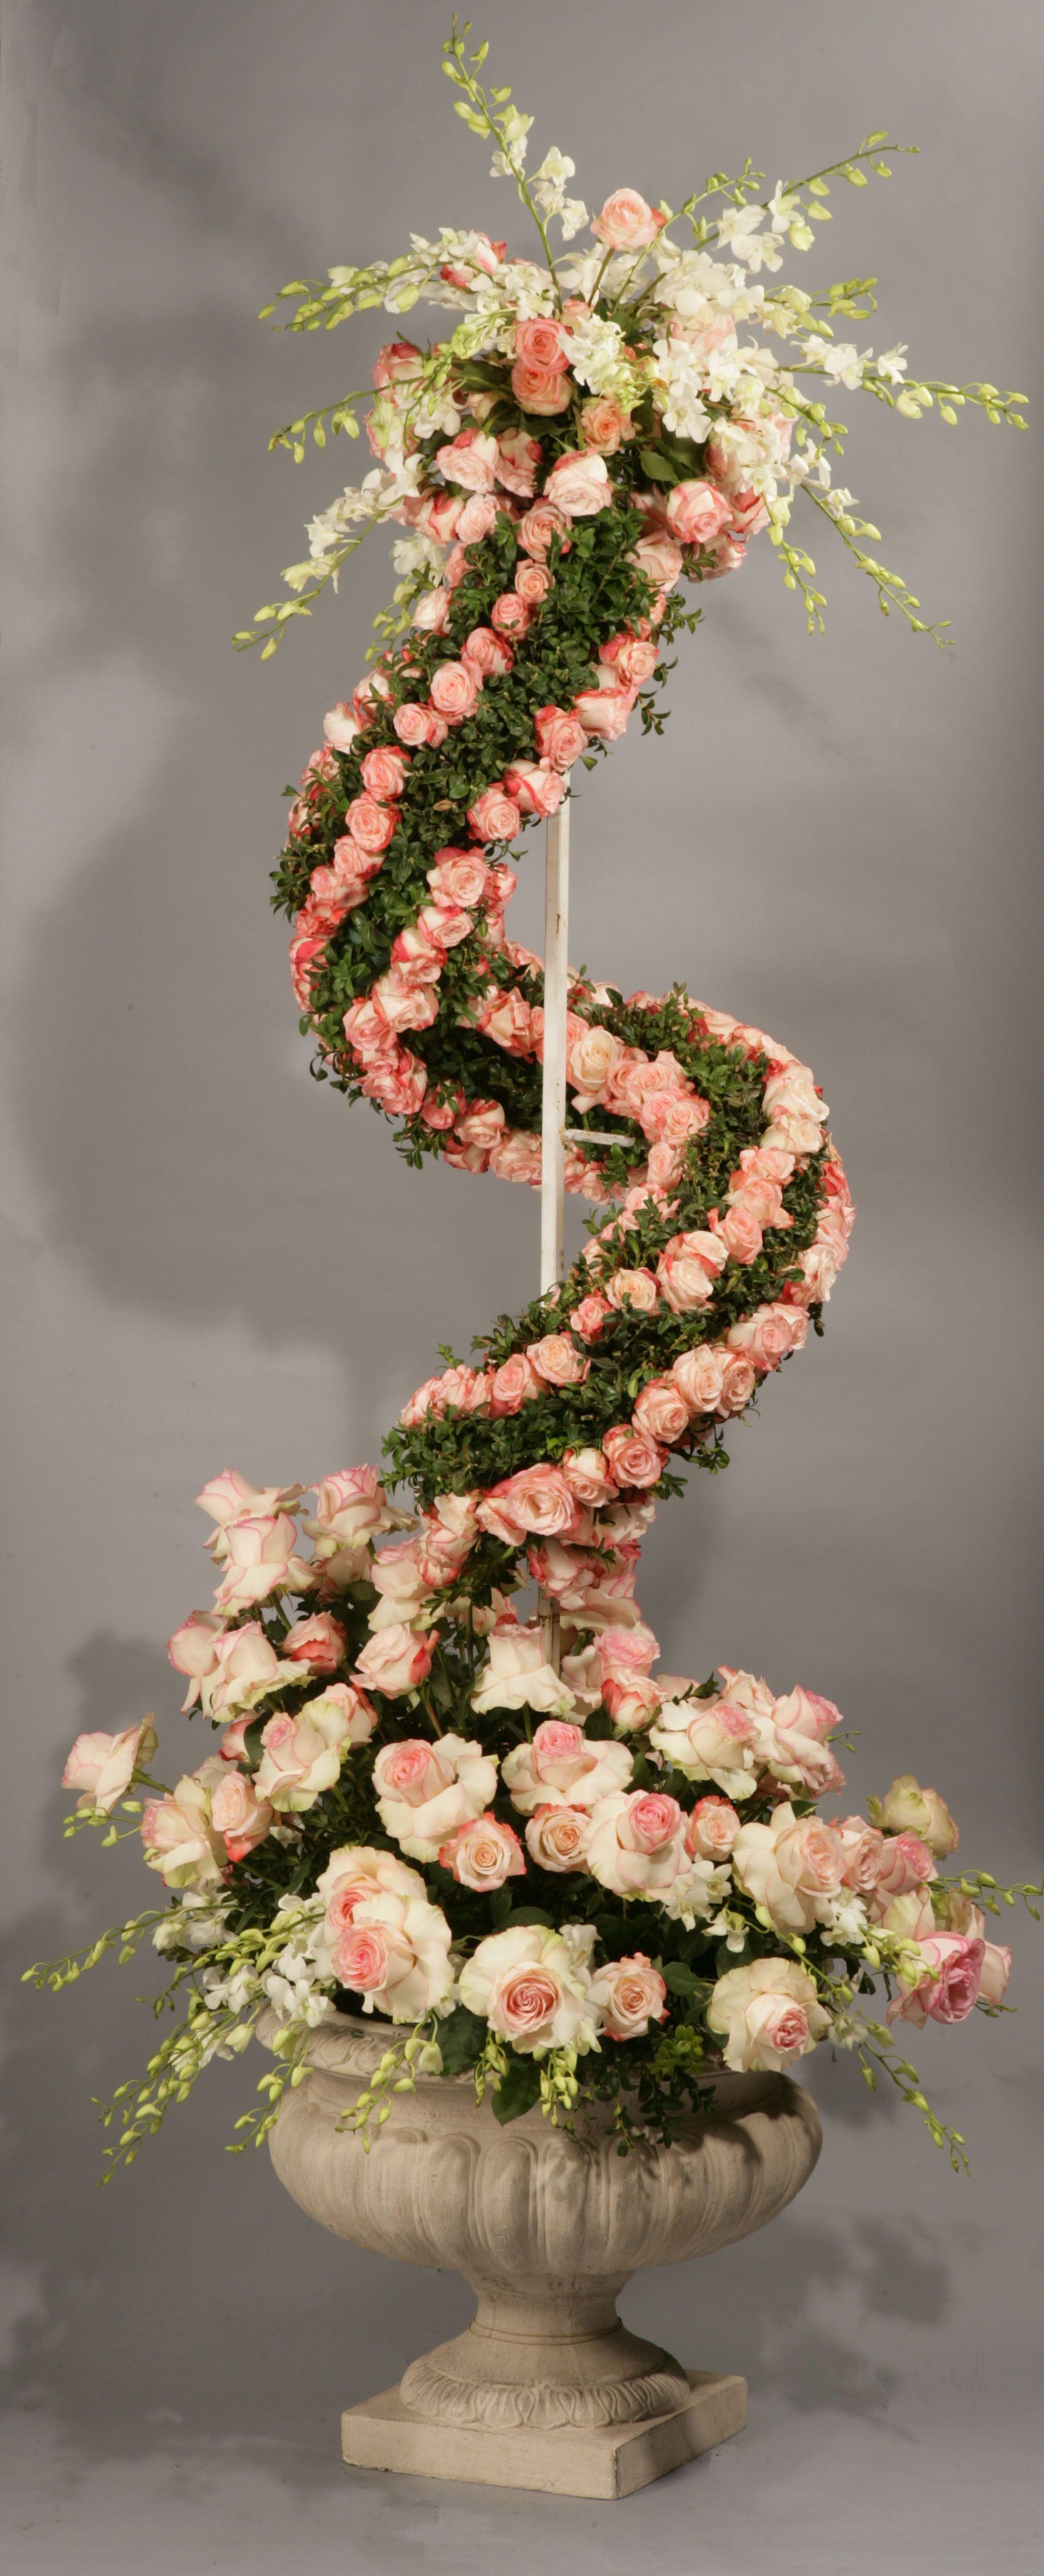 Flowers By Nino Houstons A List Florist Fowersbynino